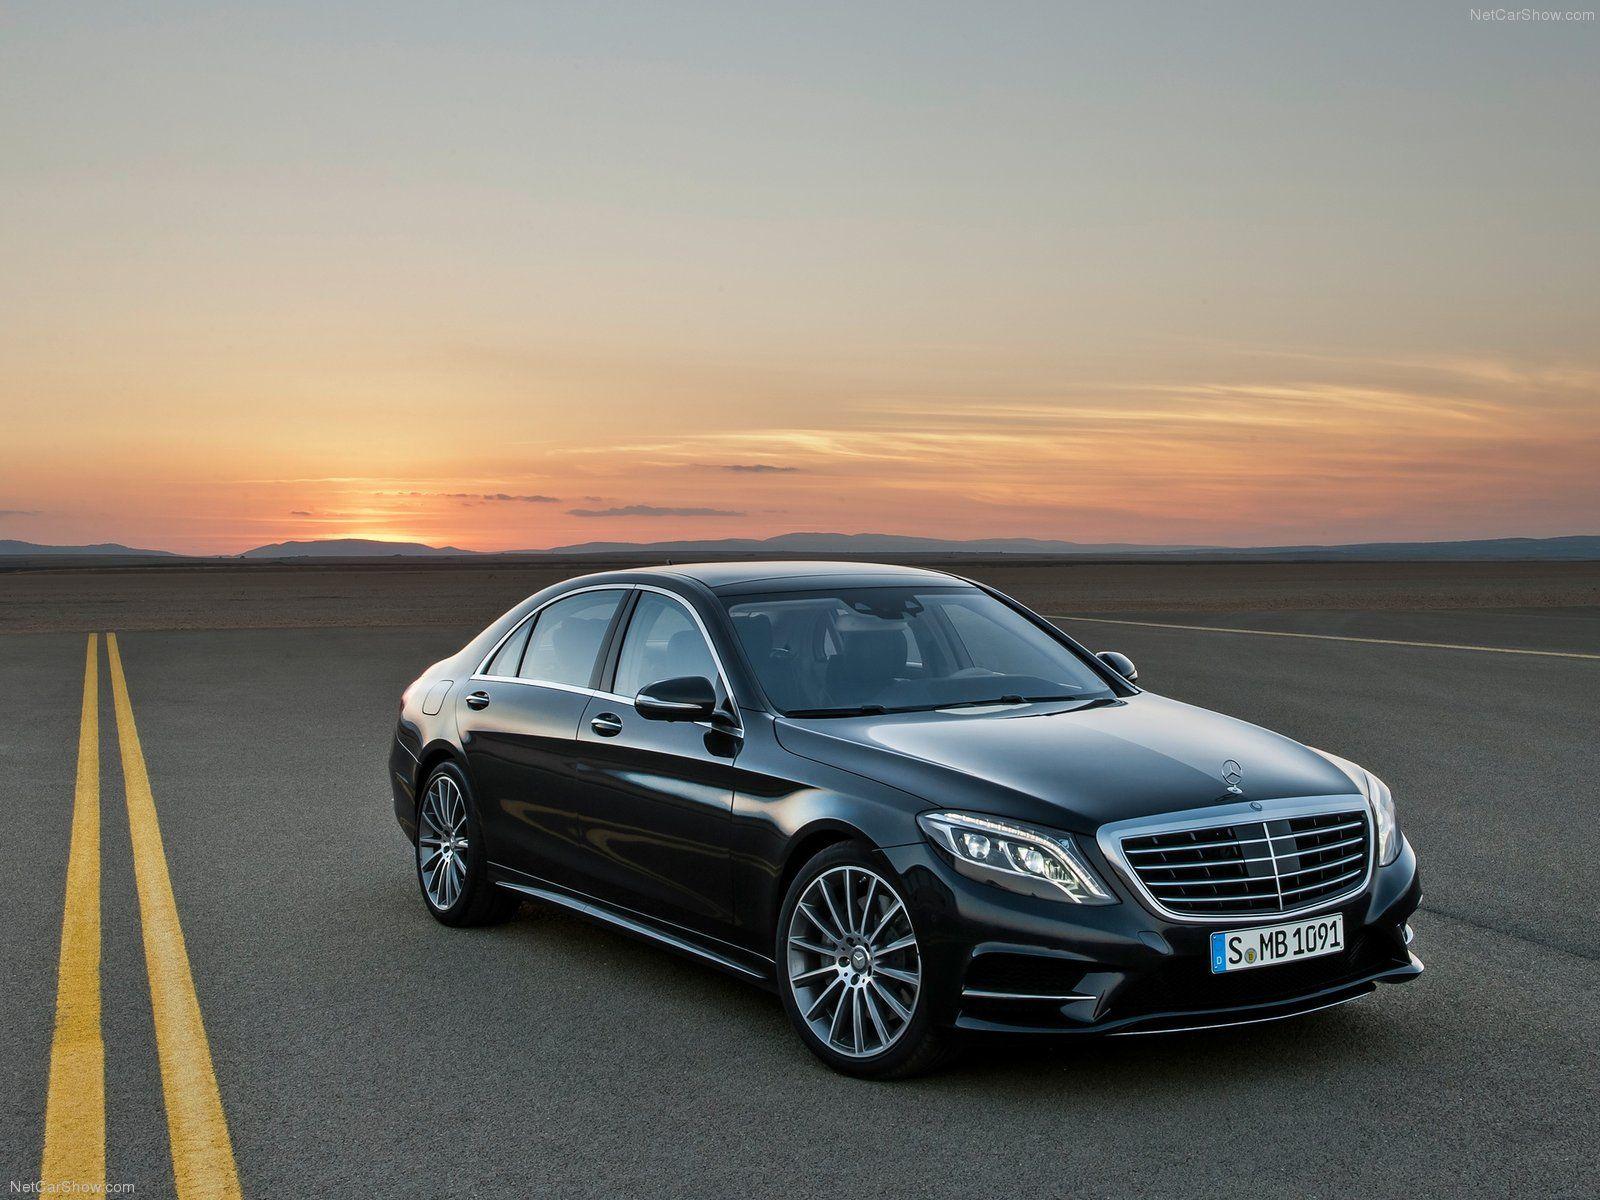 2014 Mercedes Benz SClass Dream CarMercedes Benz